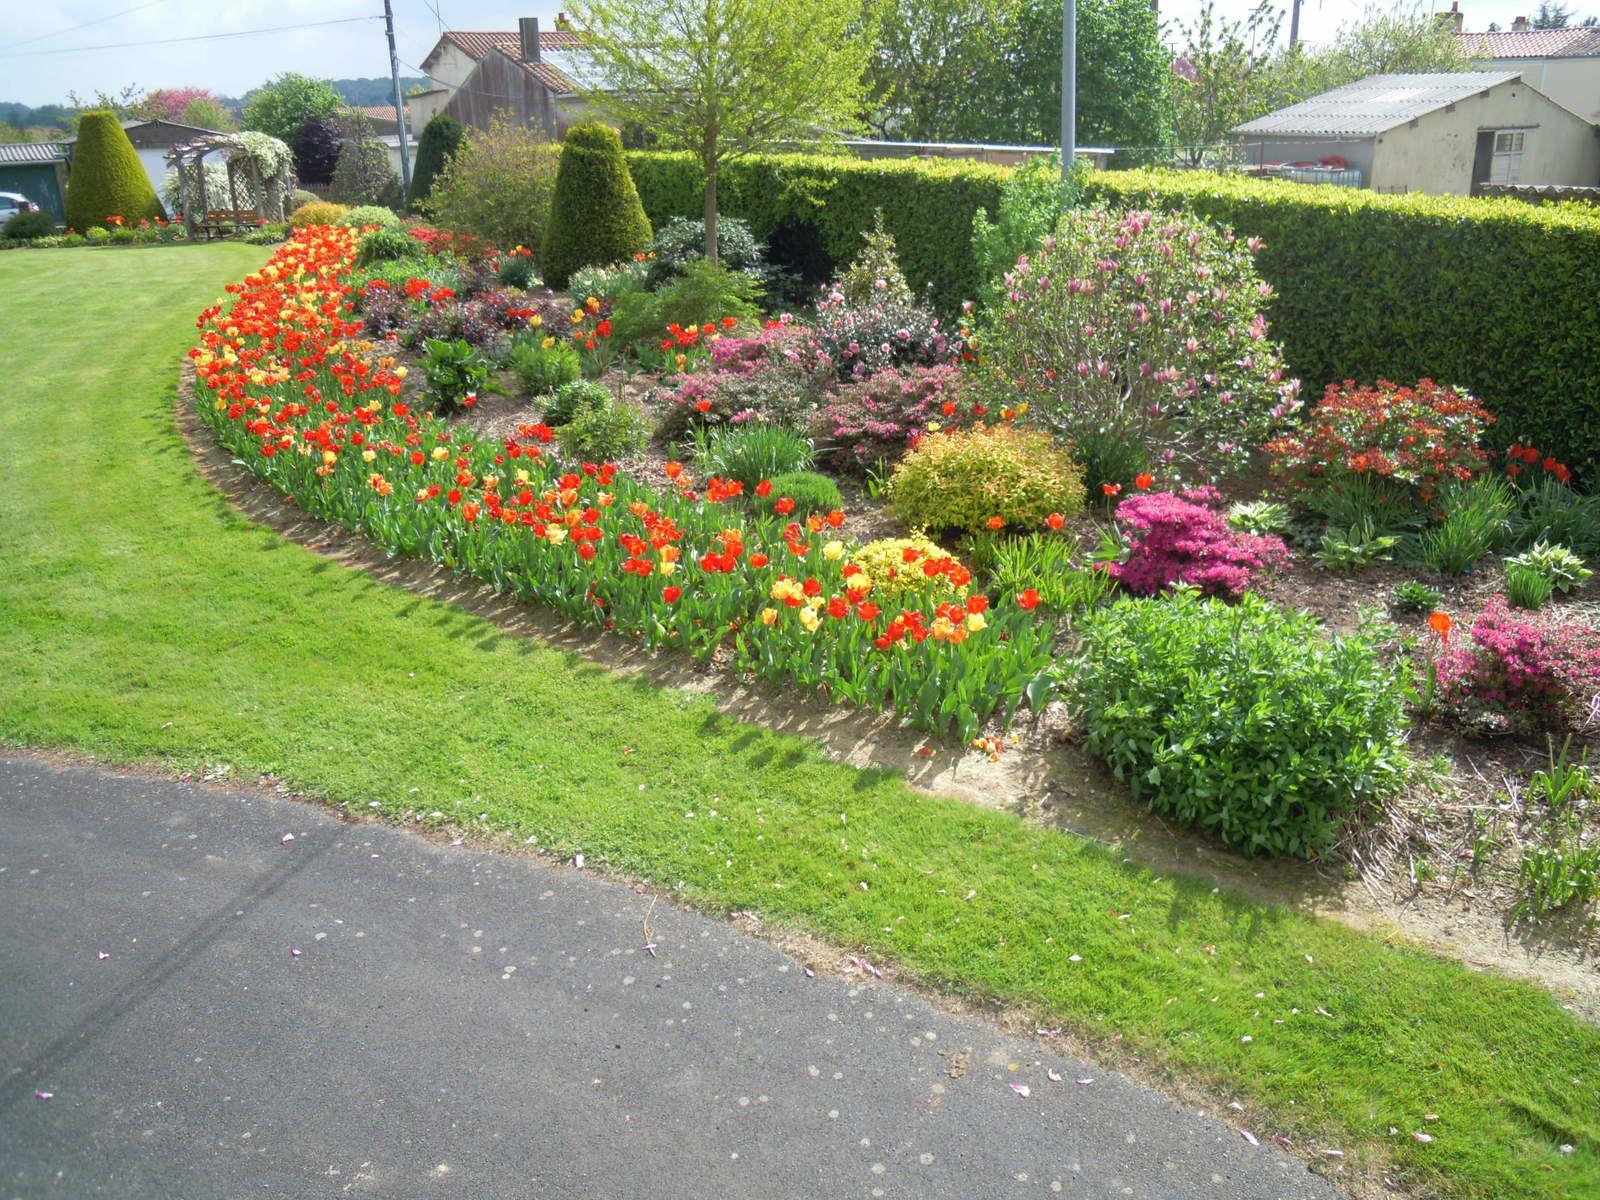 notre jardin bien fleuri r sidence la roseraie gest. Black Bedroom Furniture Sets. Home Design Ideas